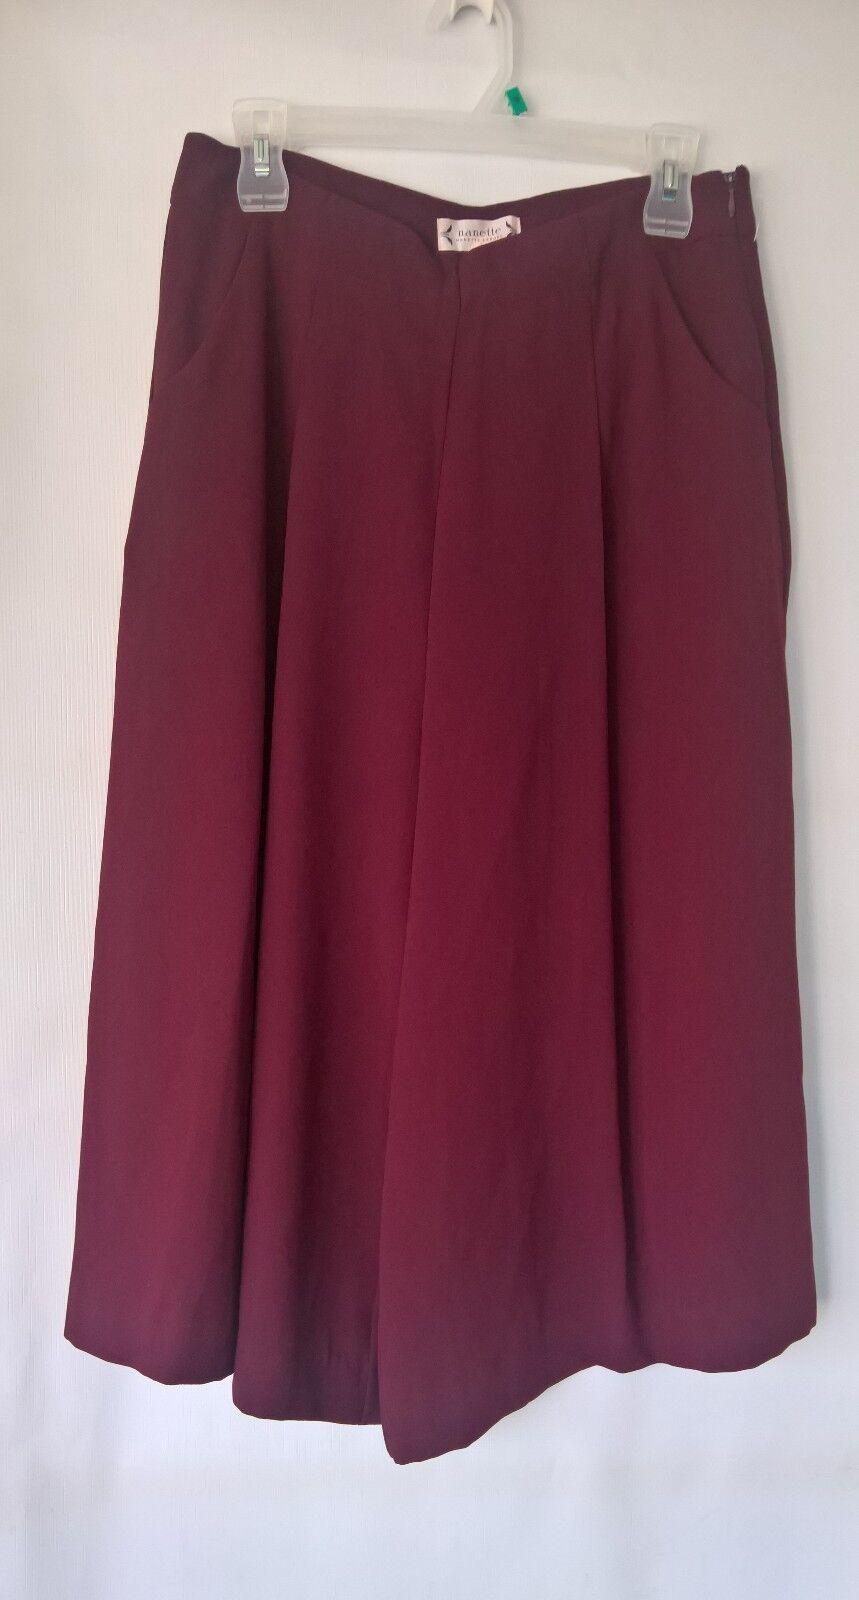 Nanette Lepore Women's Burgundy Stretch Crepe Culotte Pants Size 8